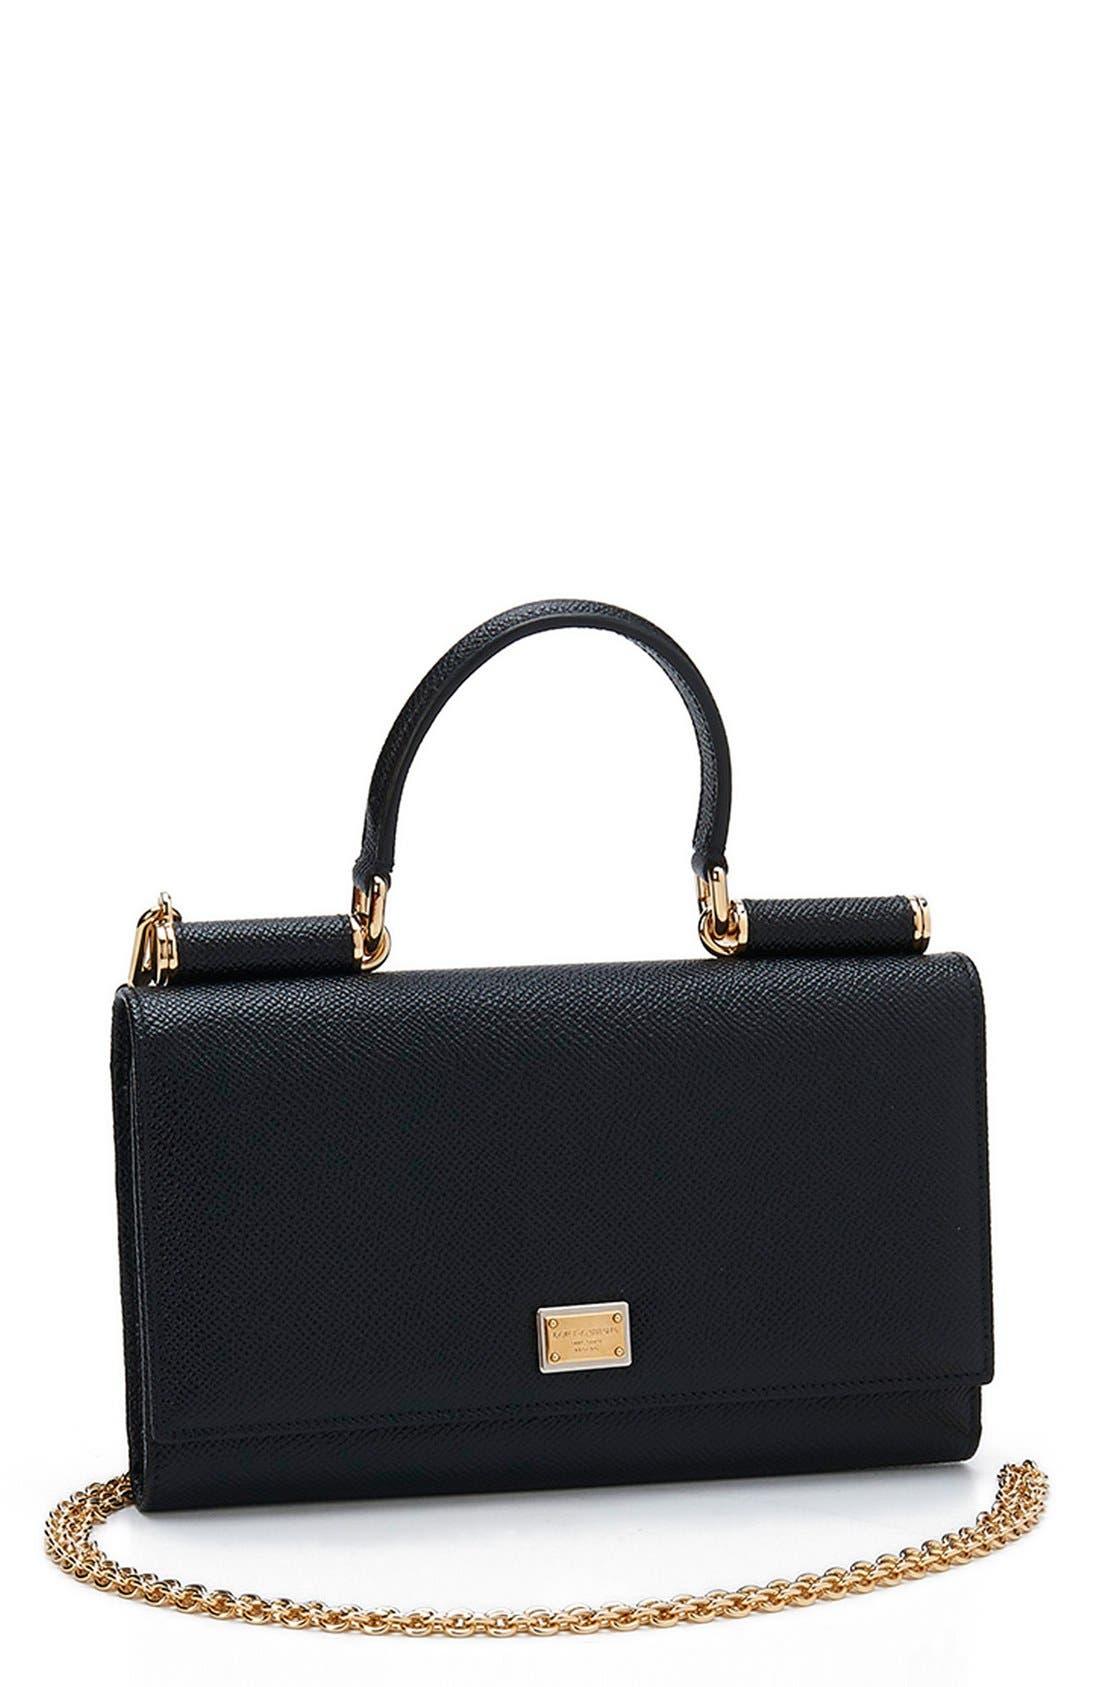 Dolce&Gabbana Wallet on a Chain